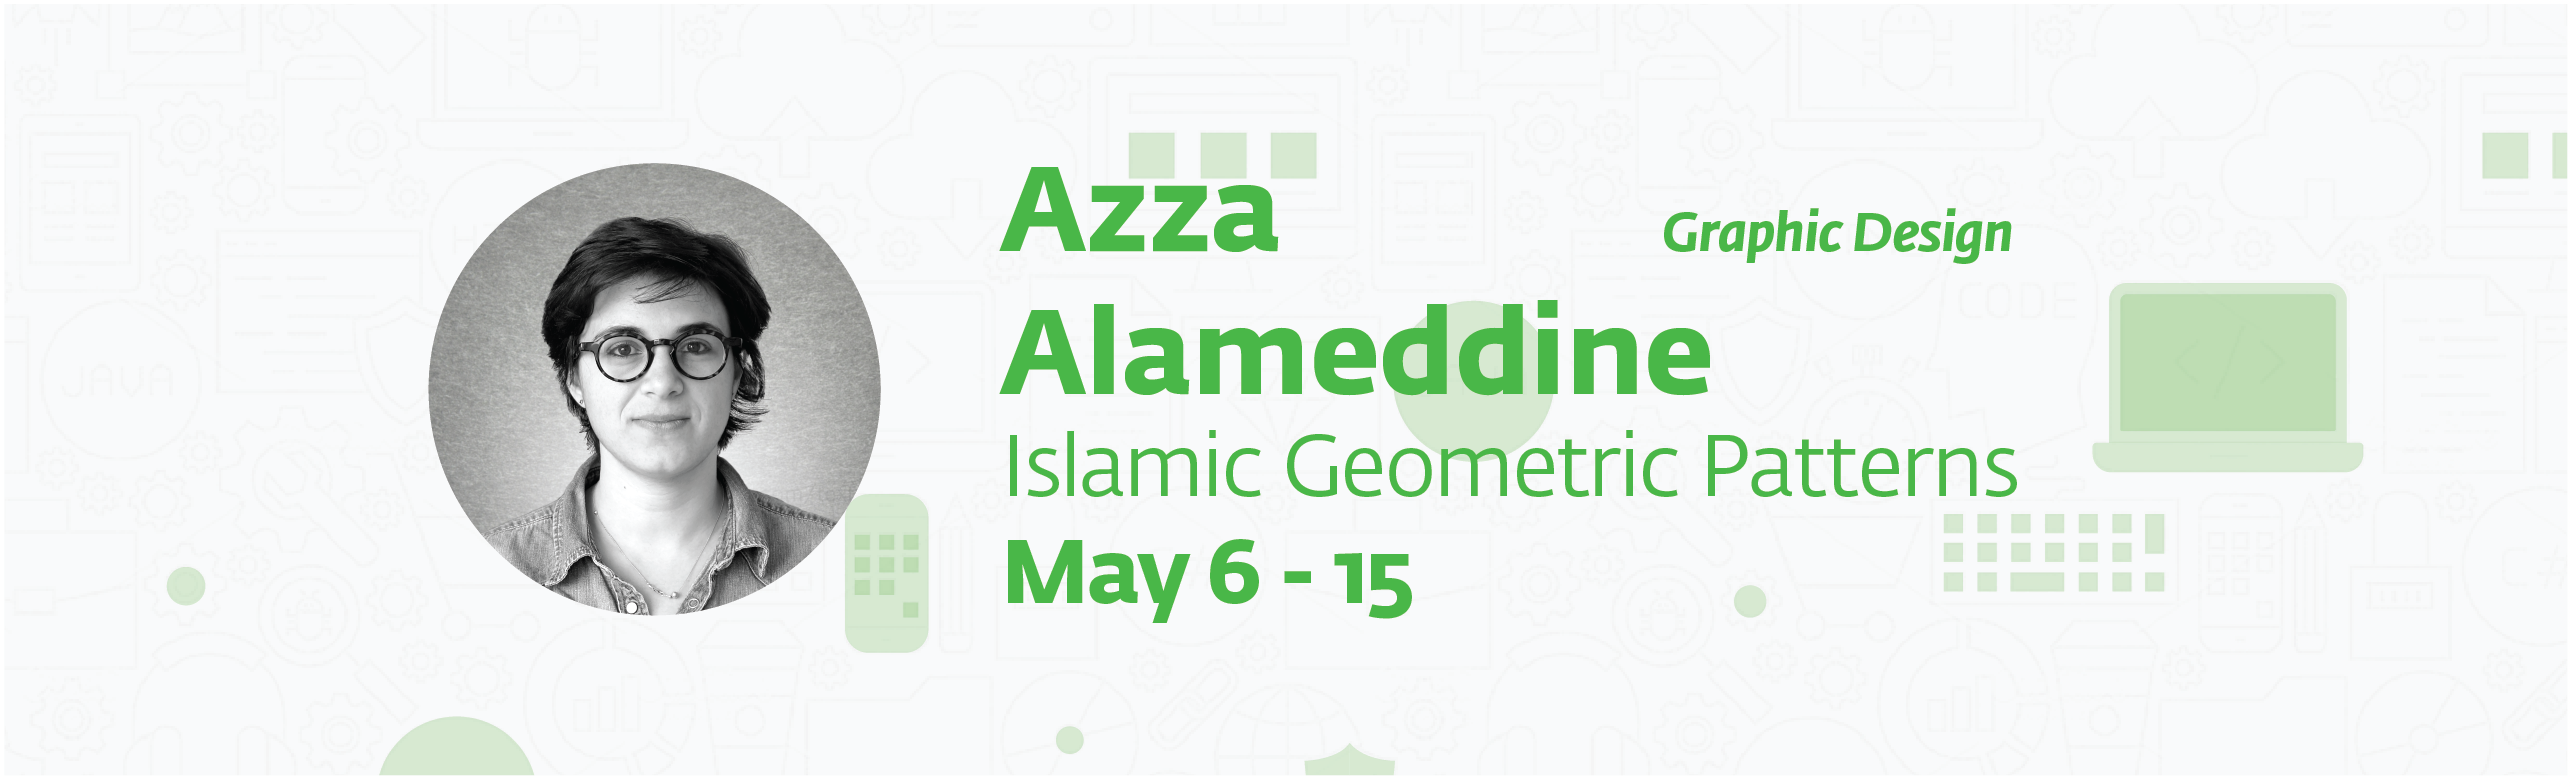 24 24 - Islamic Geometric Patterns